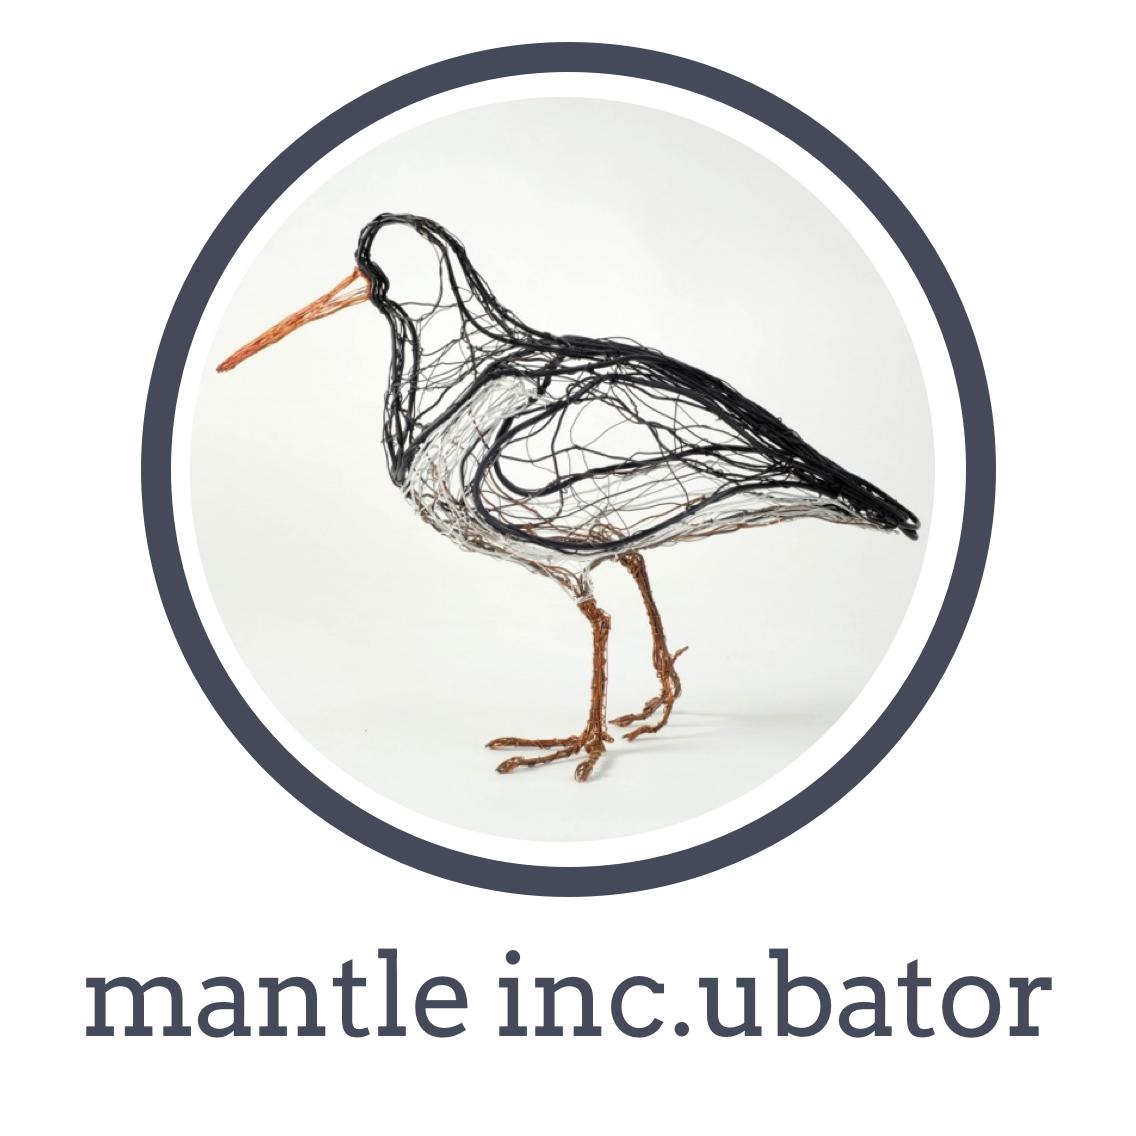 Info-economy Incubator